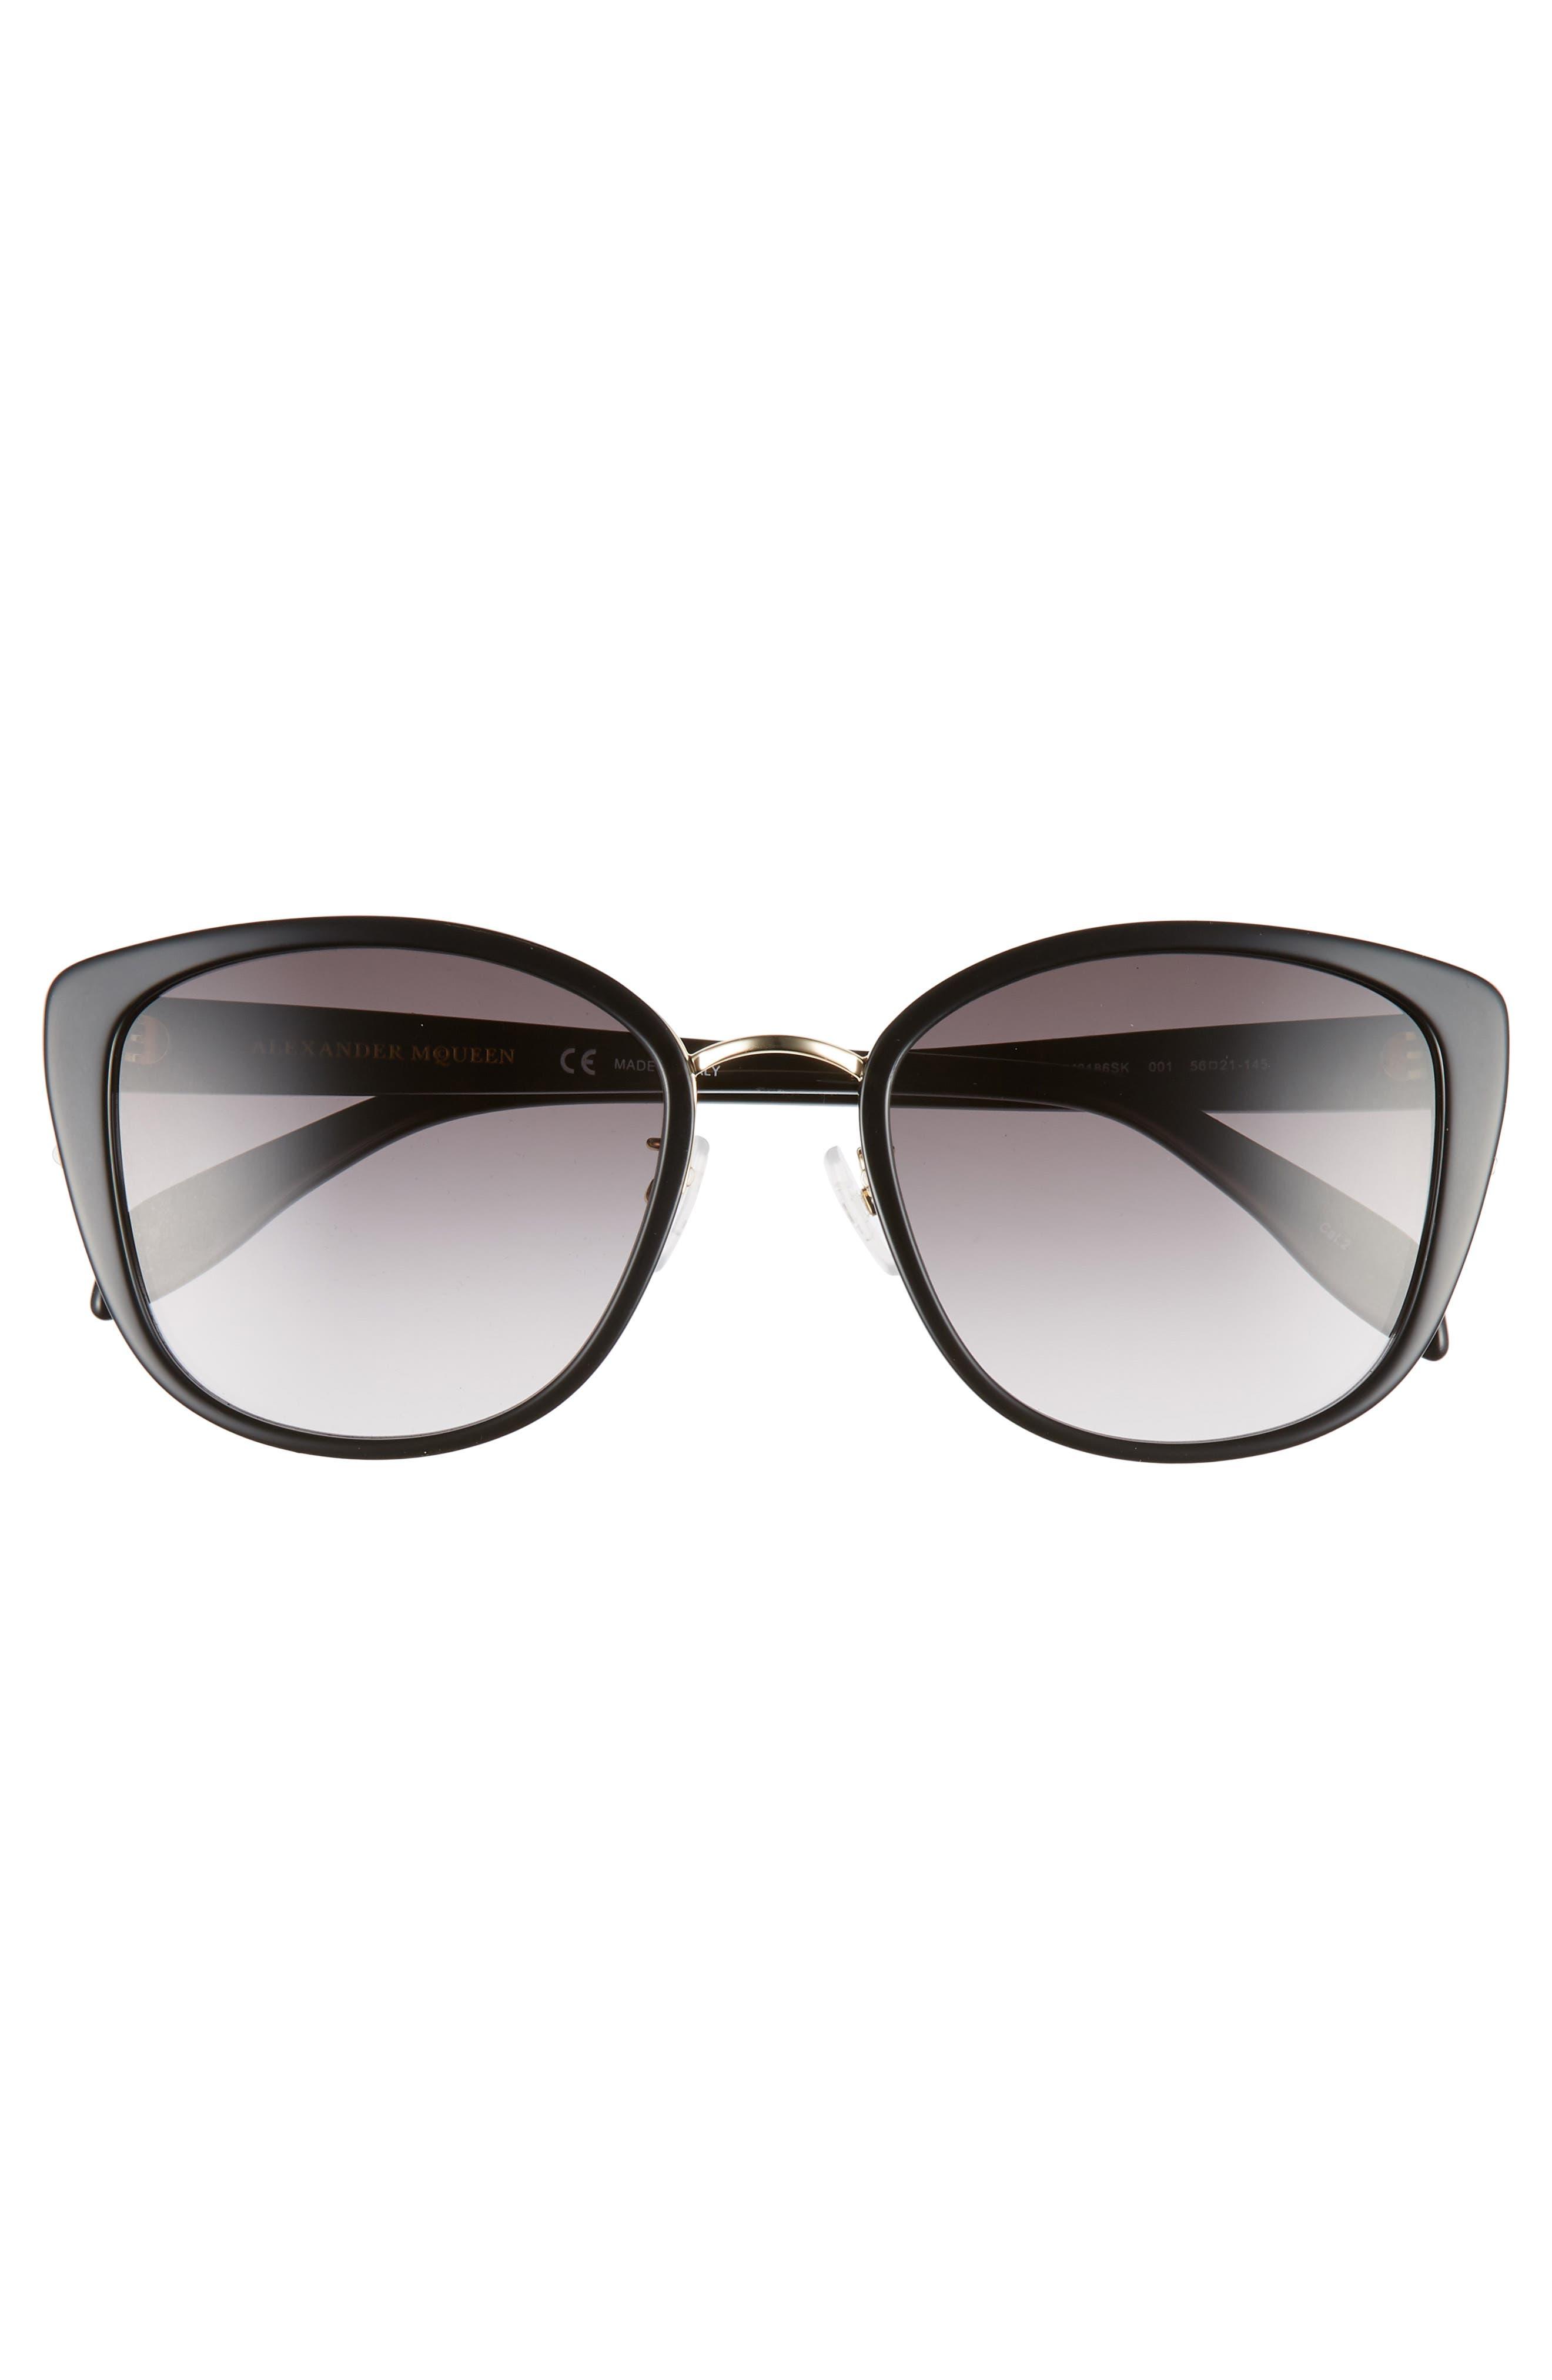 ALEXANDER MCQUEEN,                             56mm Gradient Round Sunglasses,                             Alternate thumbnail 3, color,                             BLACK/ GOLD